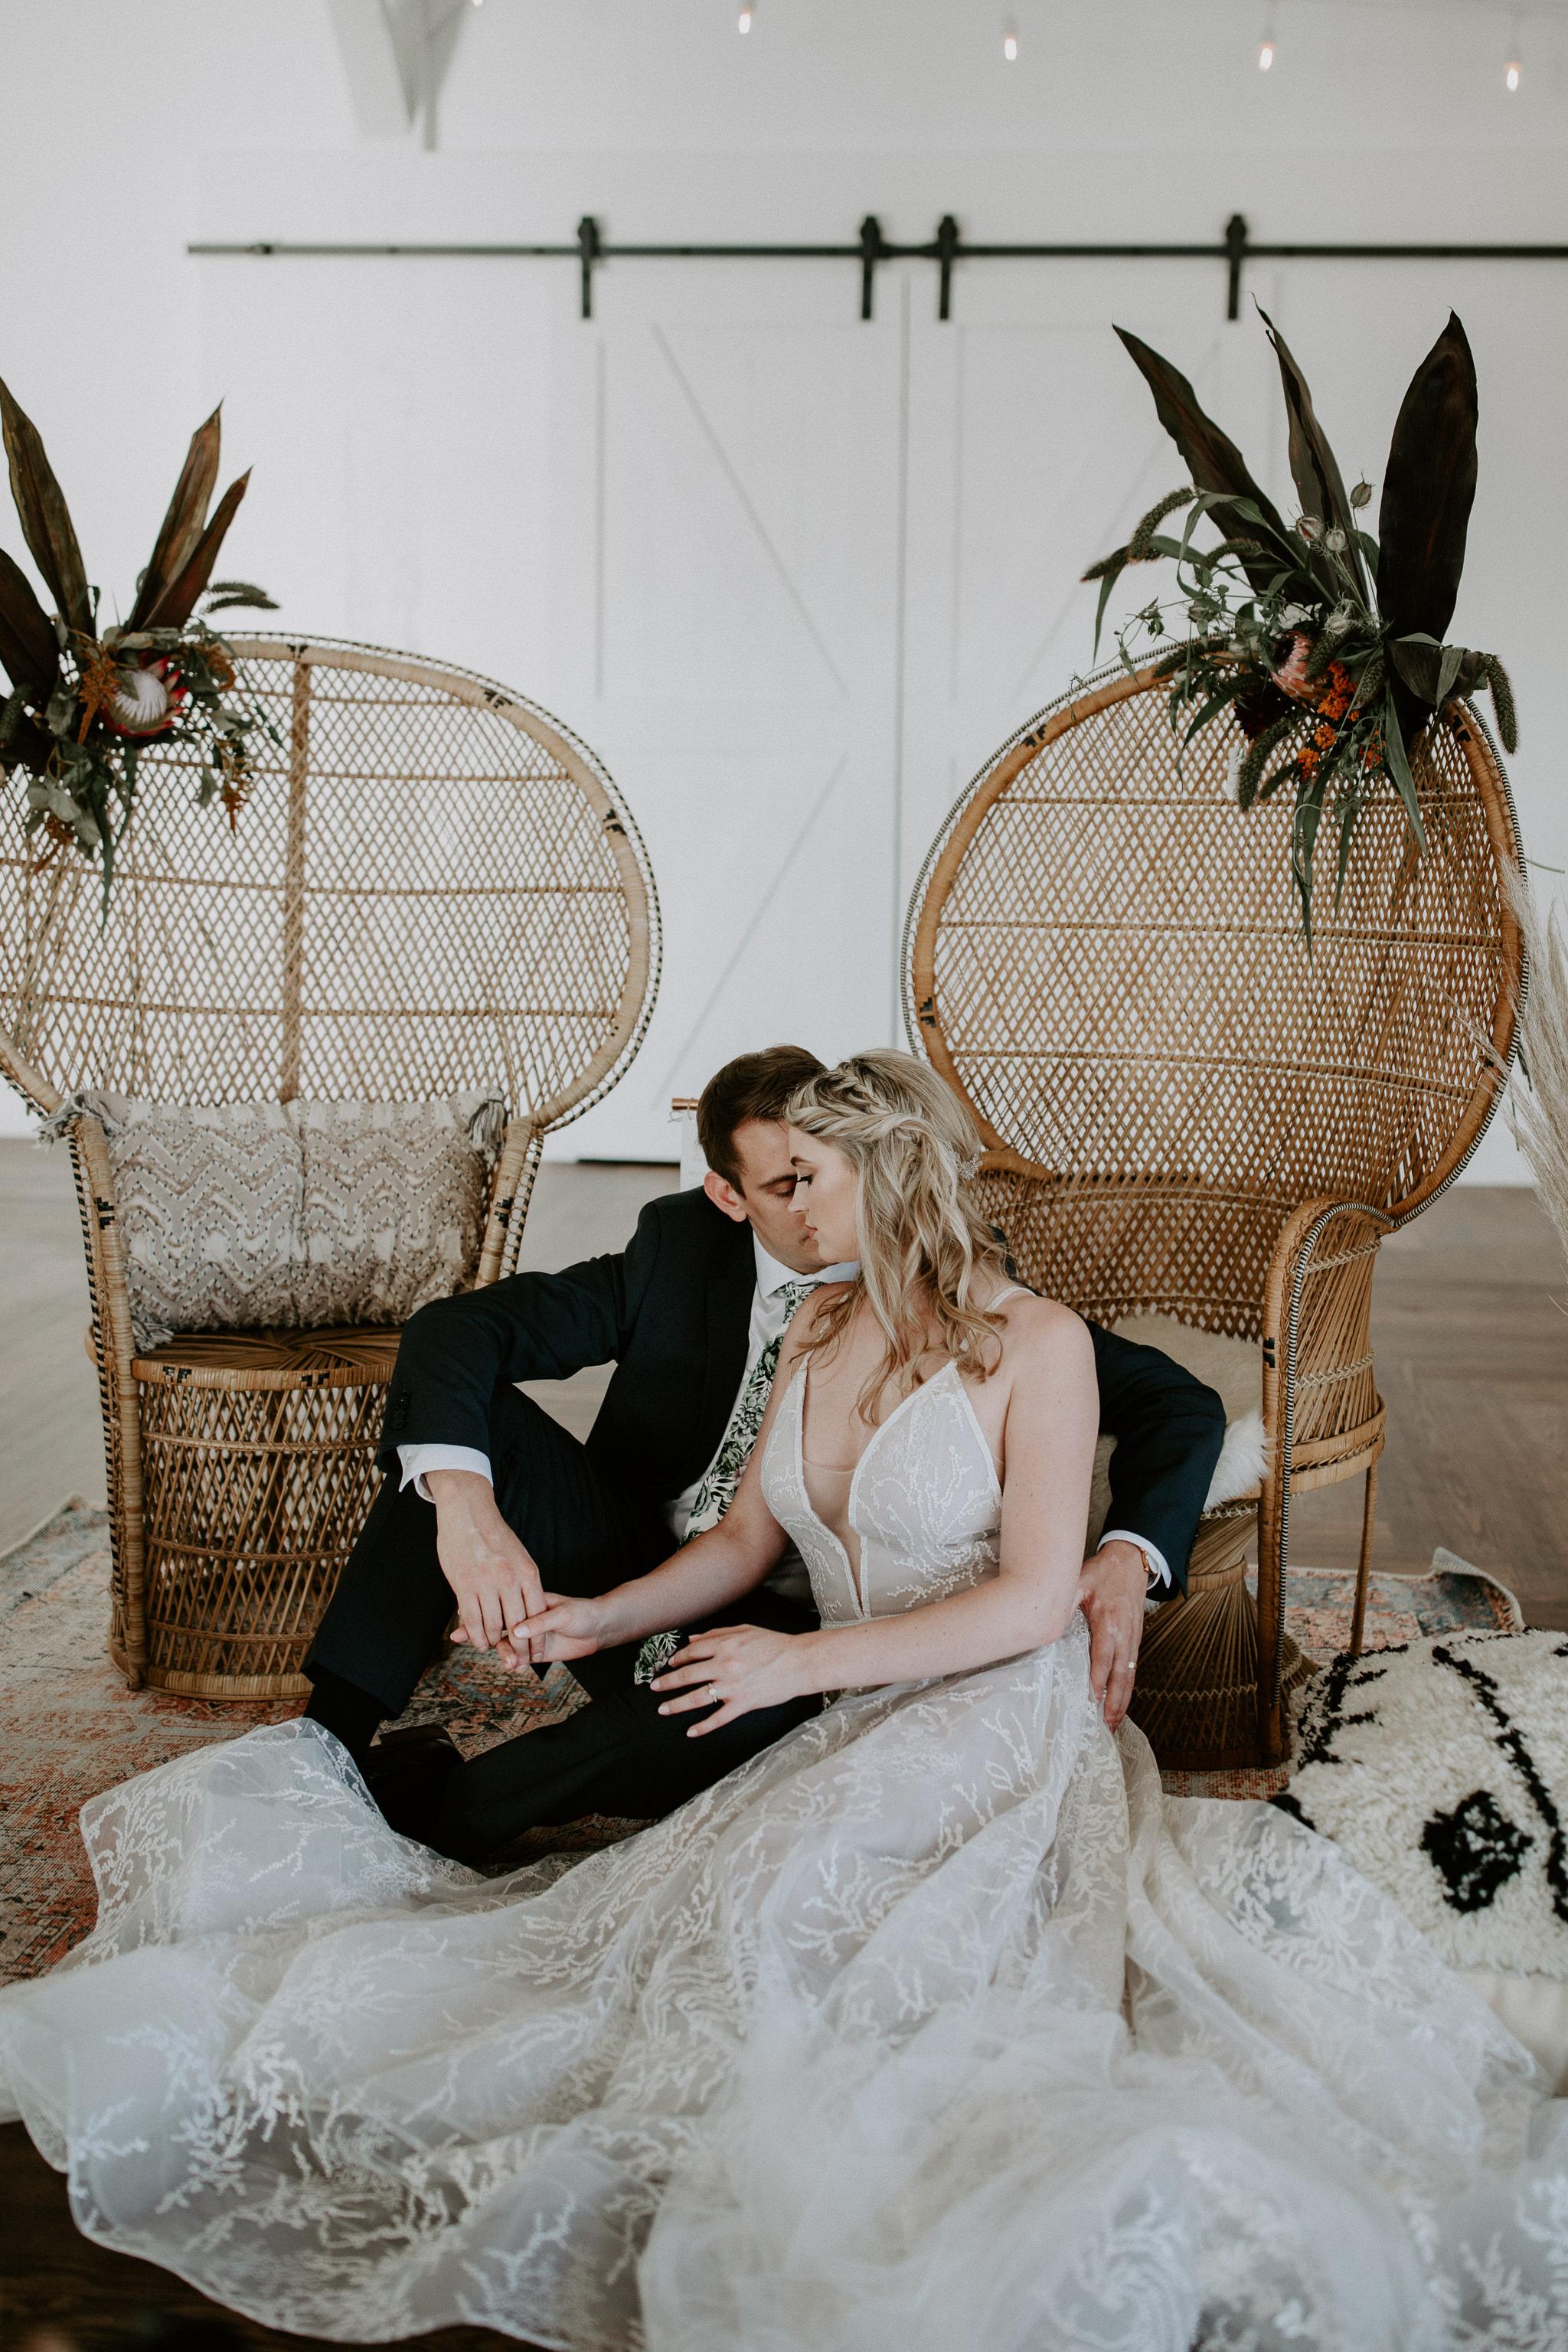 Wedding peacock chair and modern design